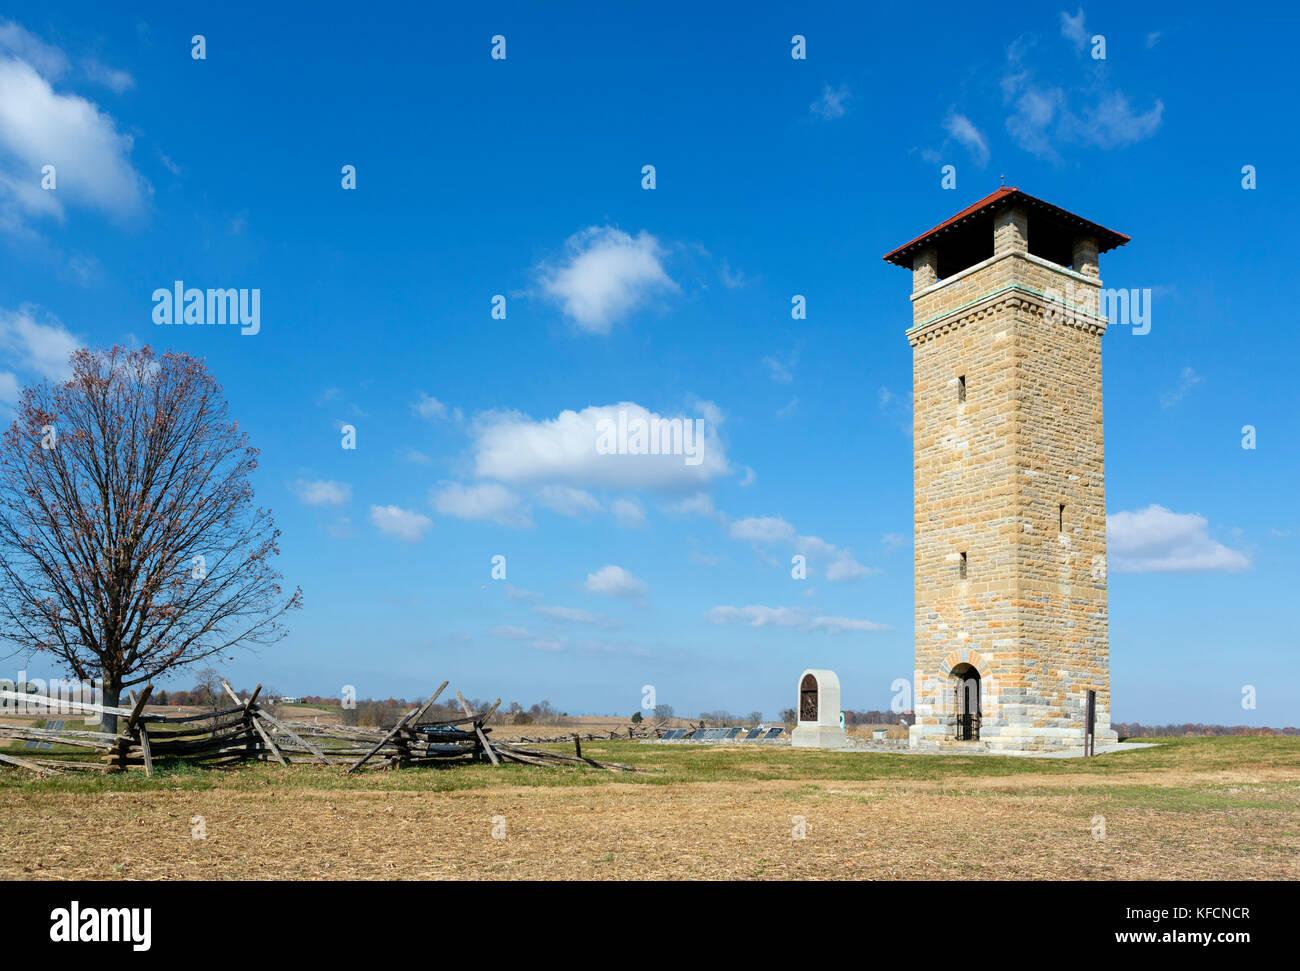 The War Department Observation Tower on Bloody Lane (Sunken Road), Antietam National Battlefield, Sharpsburg, Maryland, - Stock Image